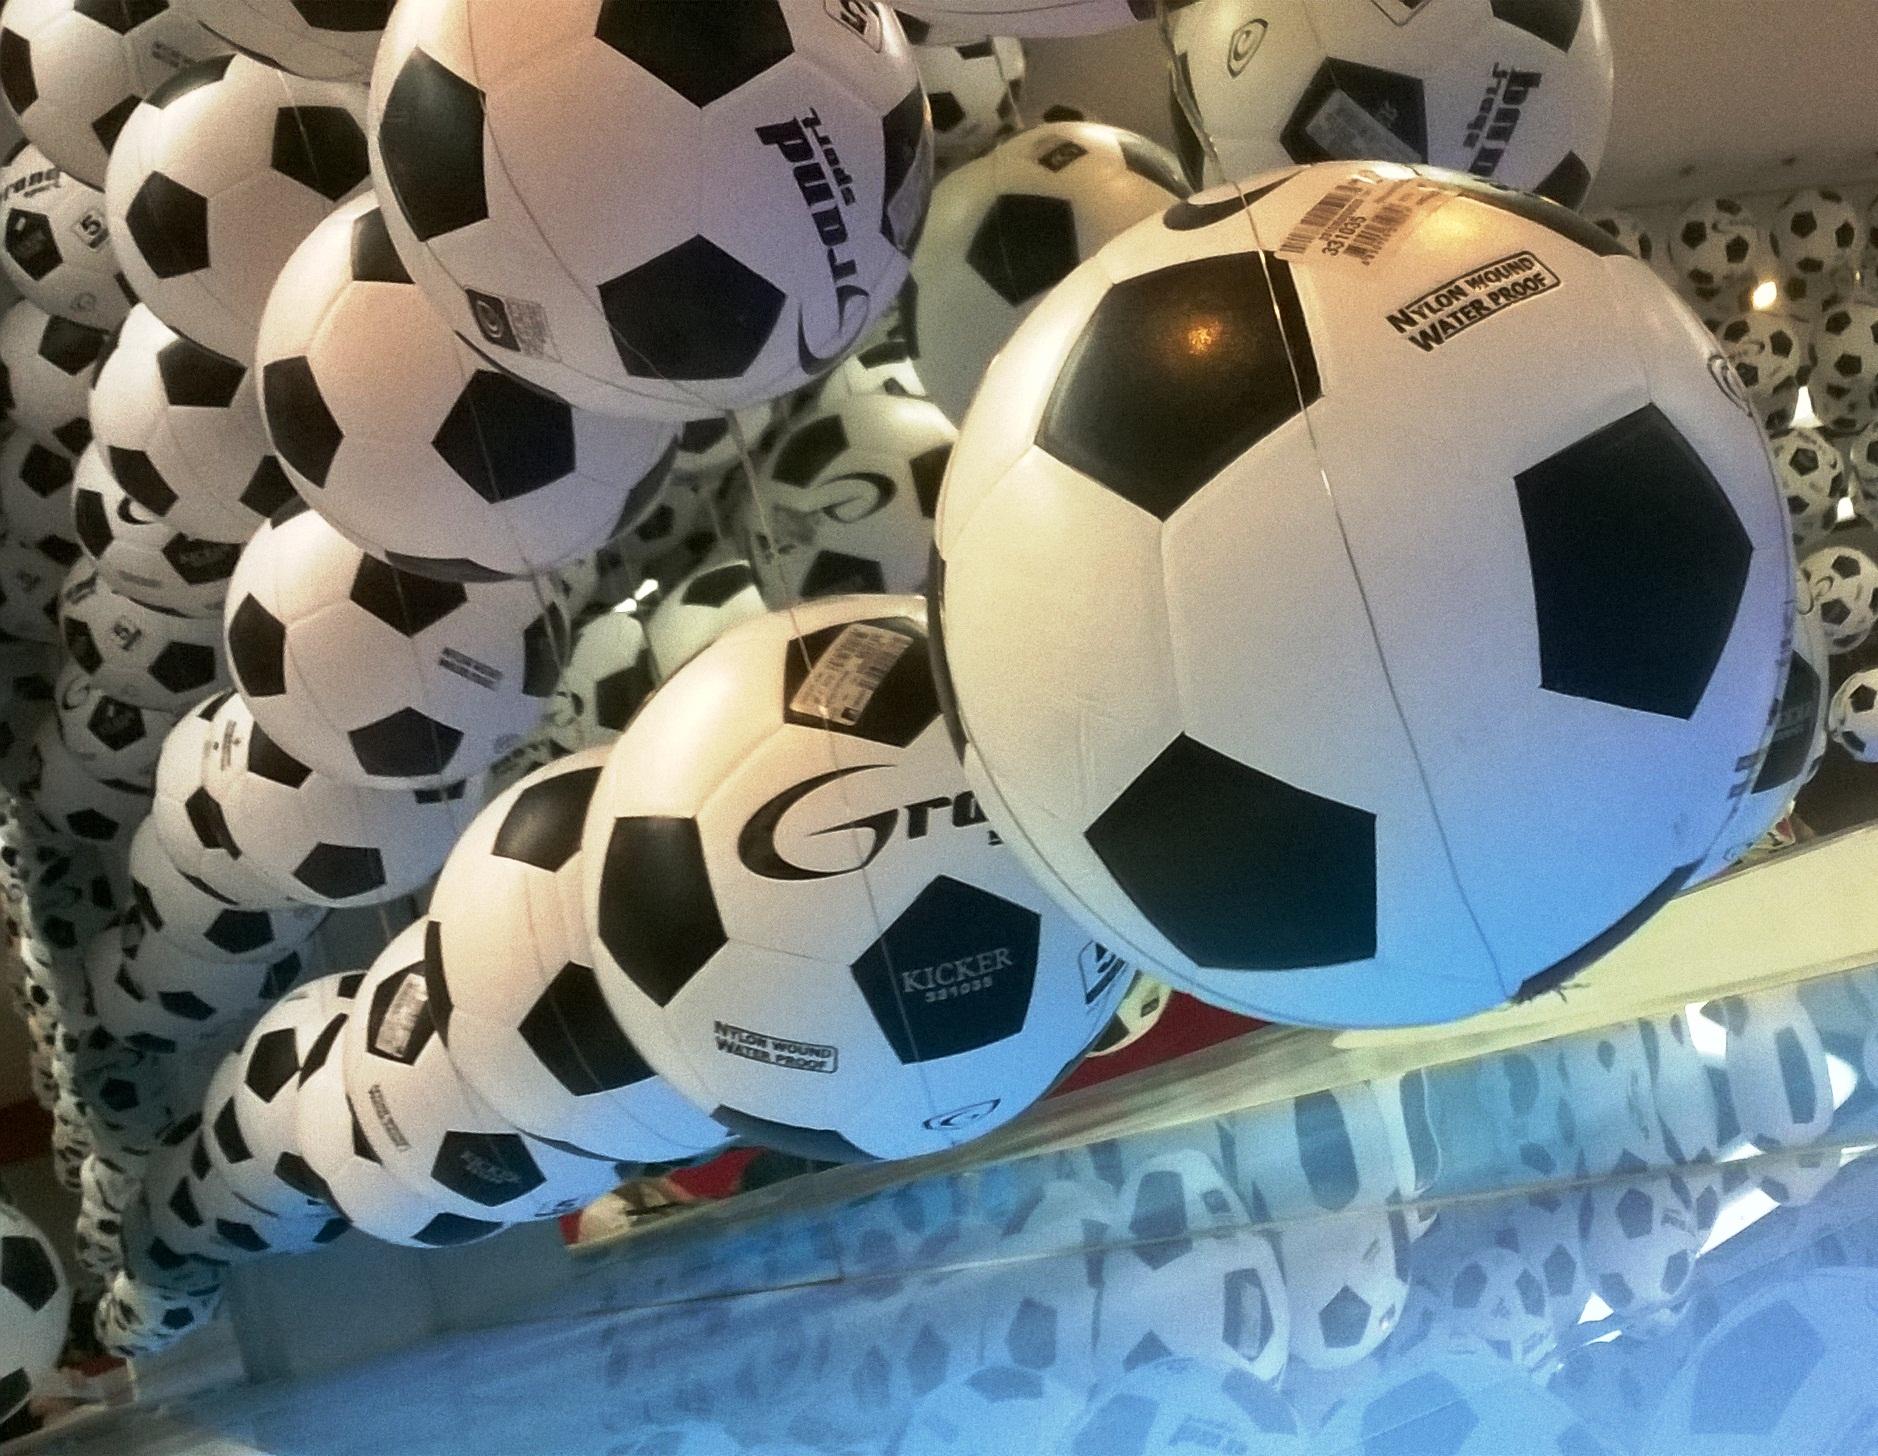 Footballs, Abstract, Interior, Win, Sports, HQ Photo